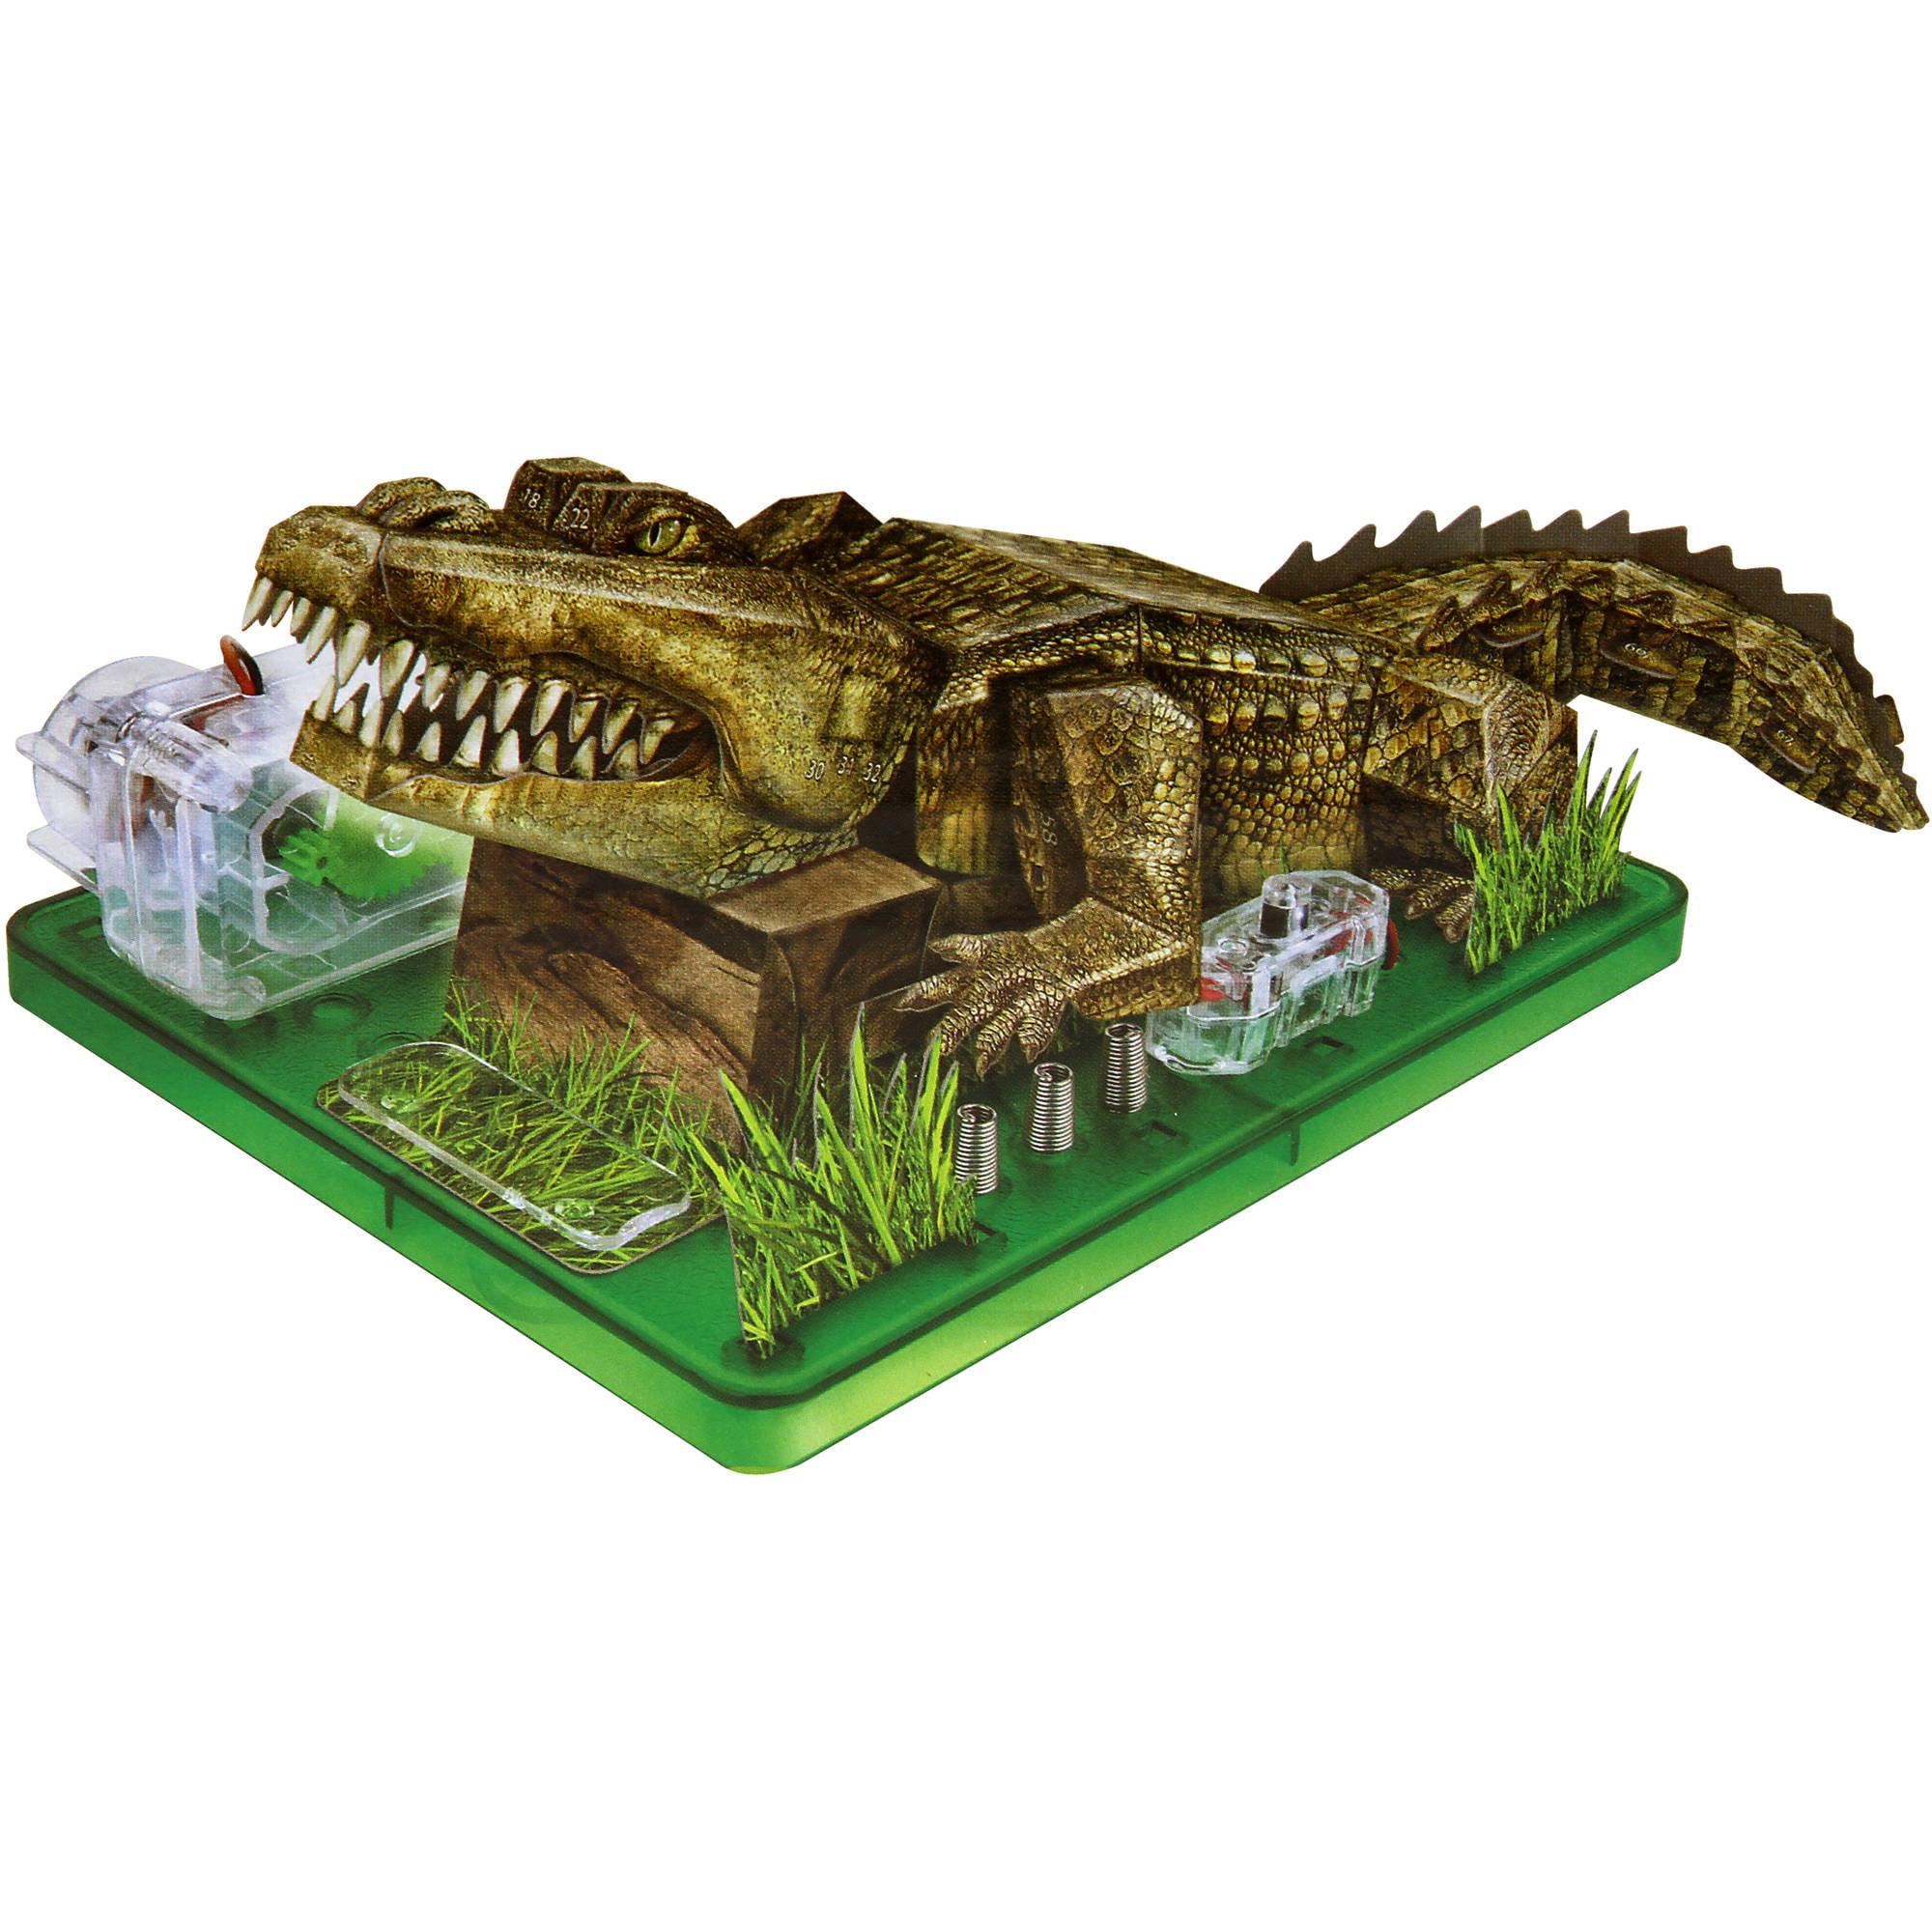 DGL Group Aww Industries Motorized Crocodile 3D Puzzle, Green